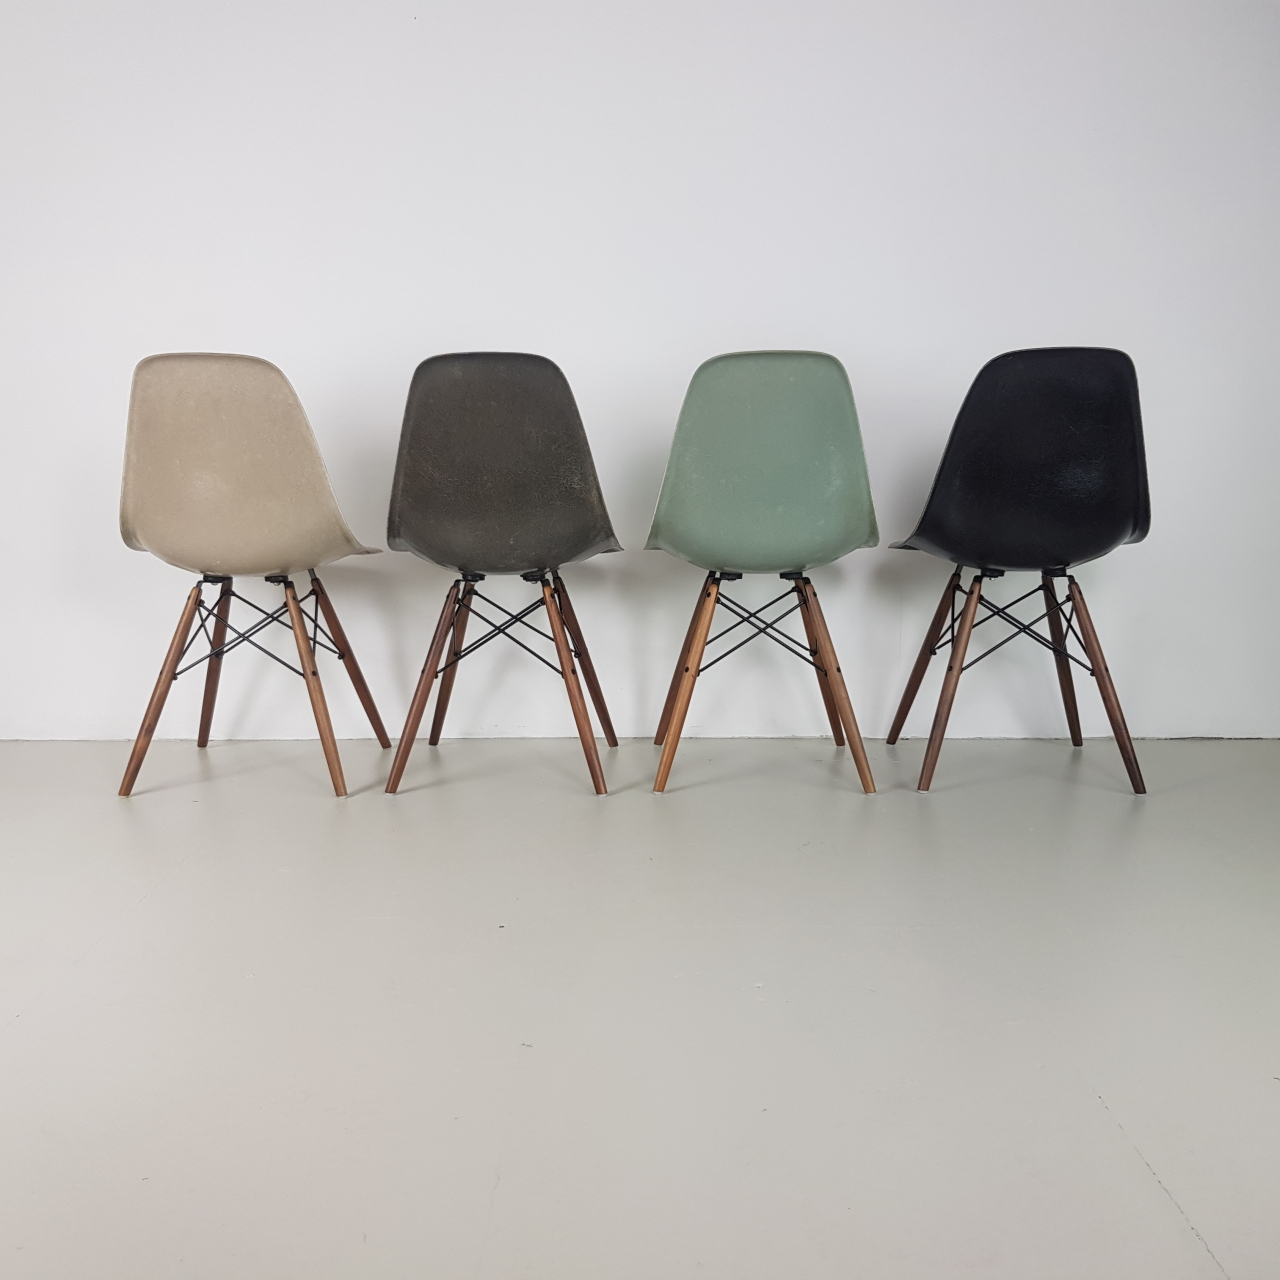 Eames Herman Miller Dsw Side Chairs In Light Greige